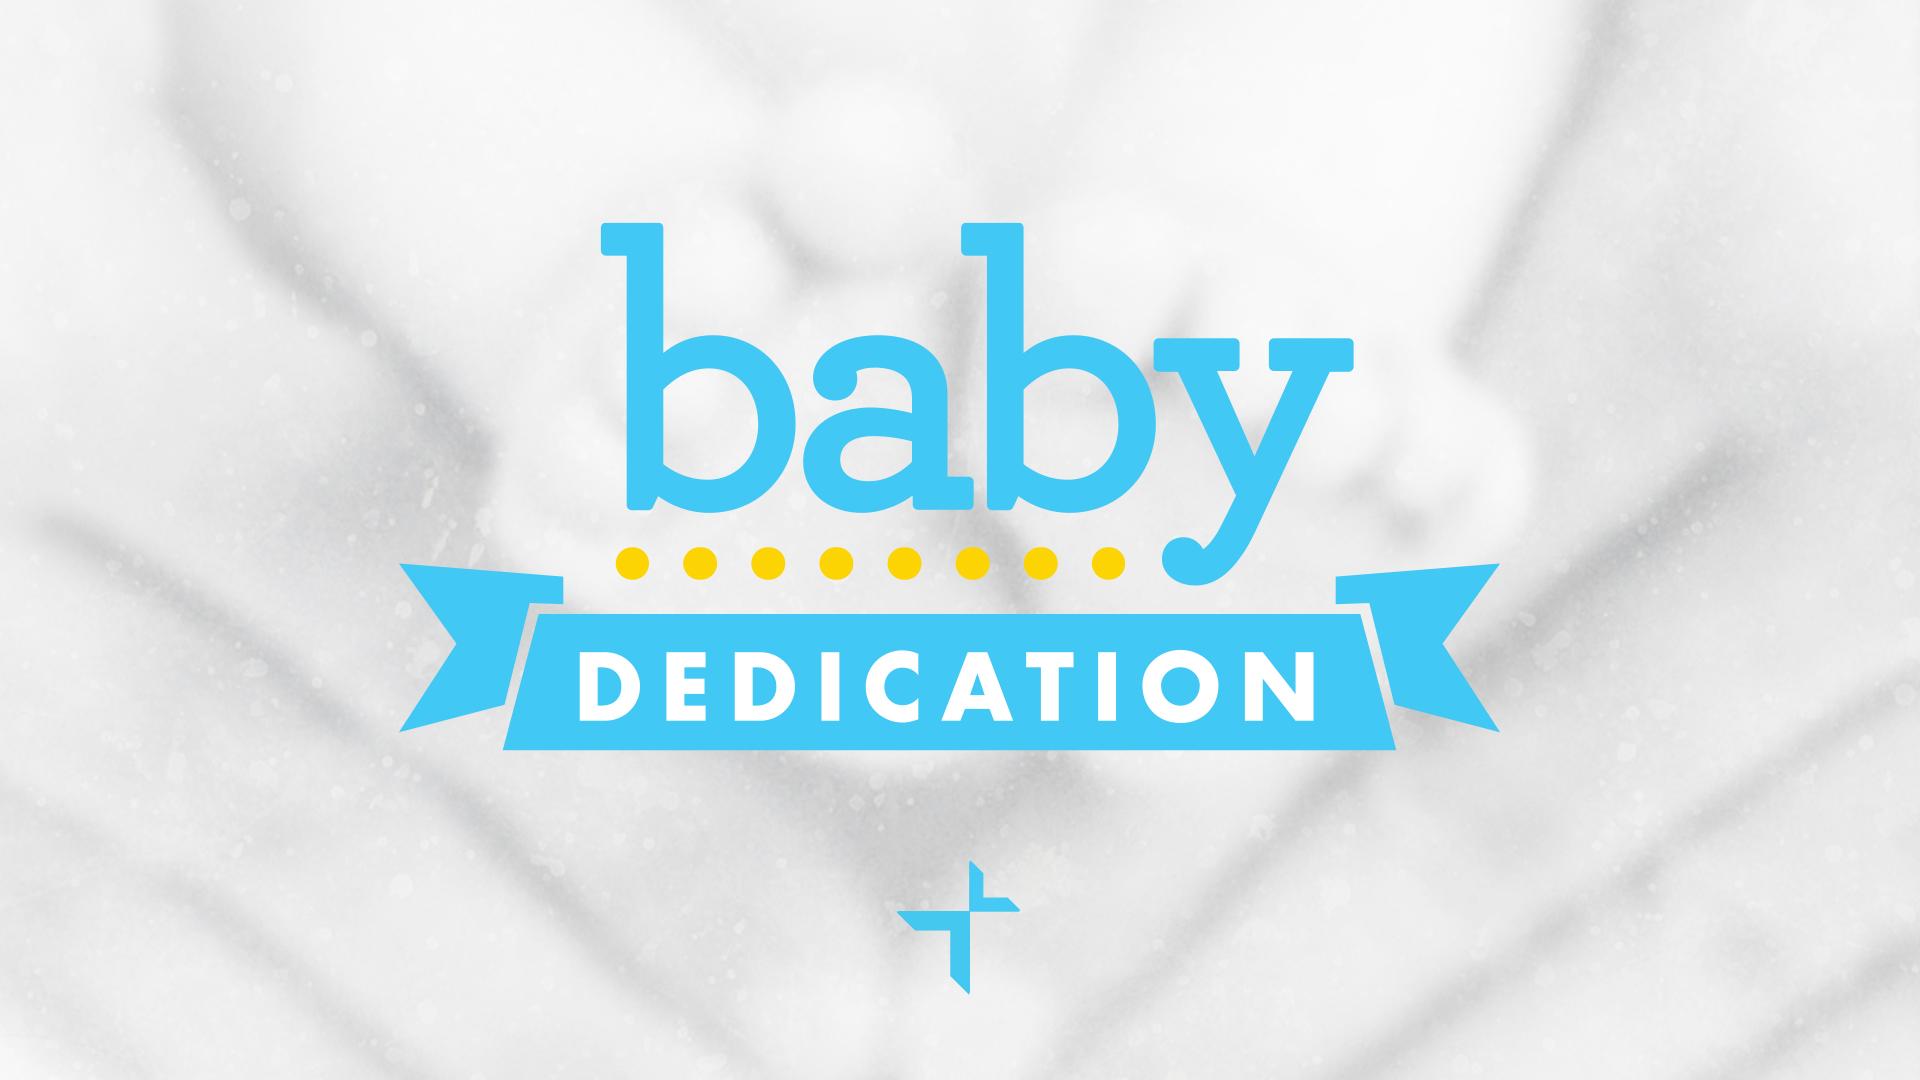 Babydedication no date